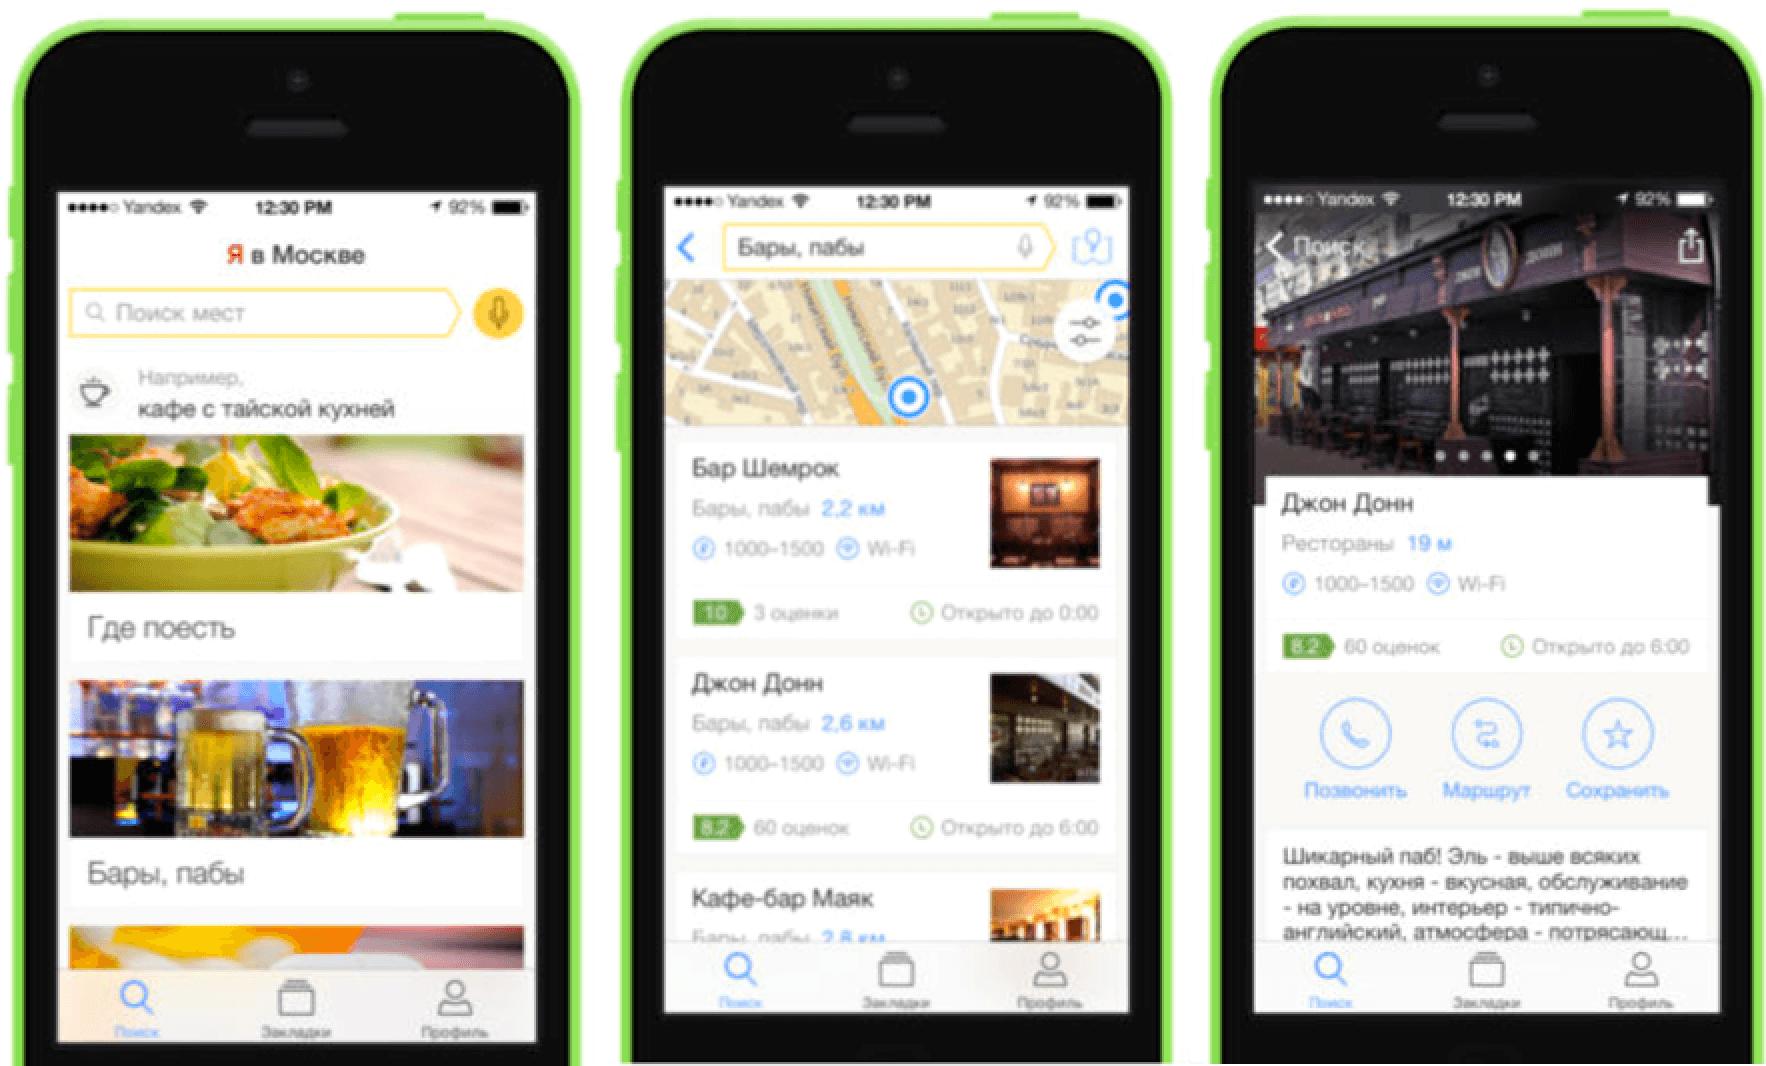 Yandex City for iOS